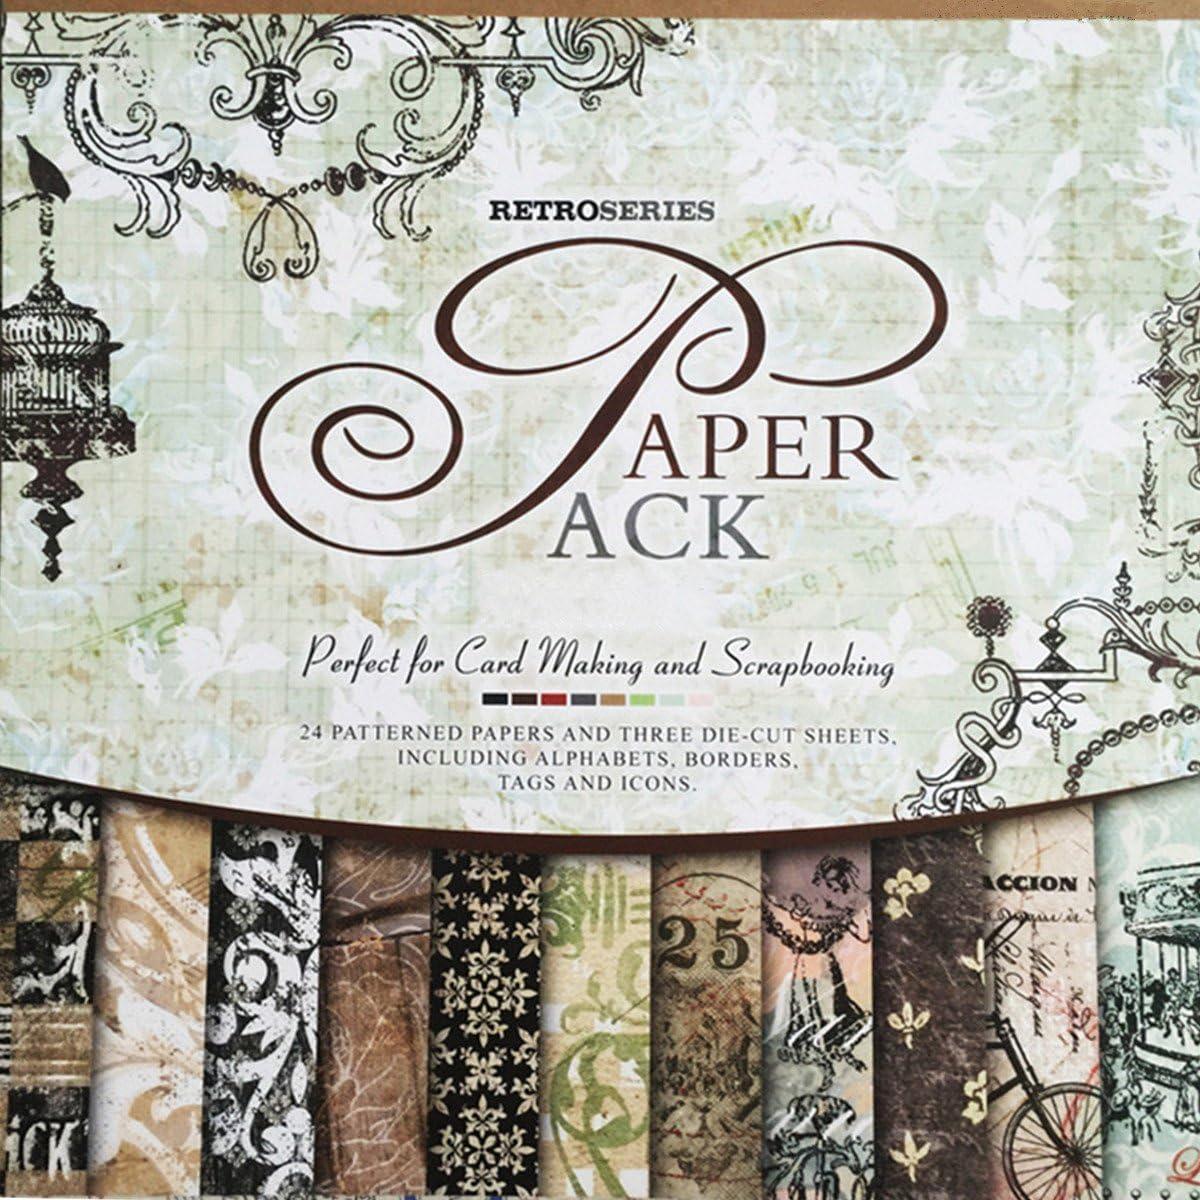 A//4 Classic Decoupage Paper Scrapbook Sheet Vintage Love Date 3